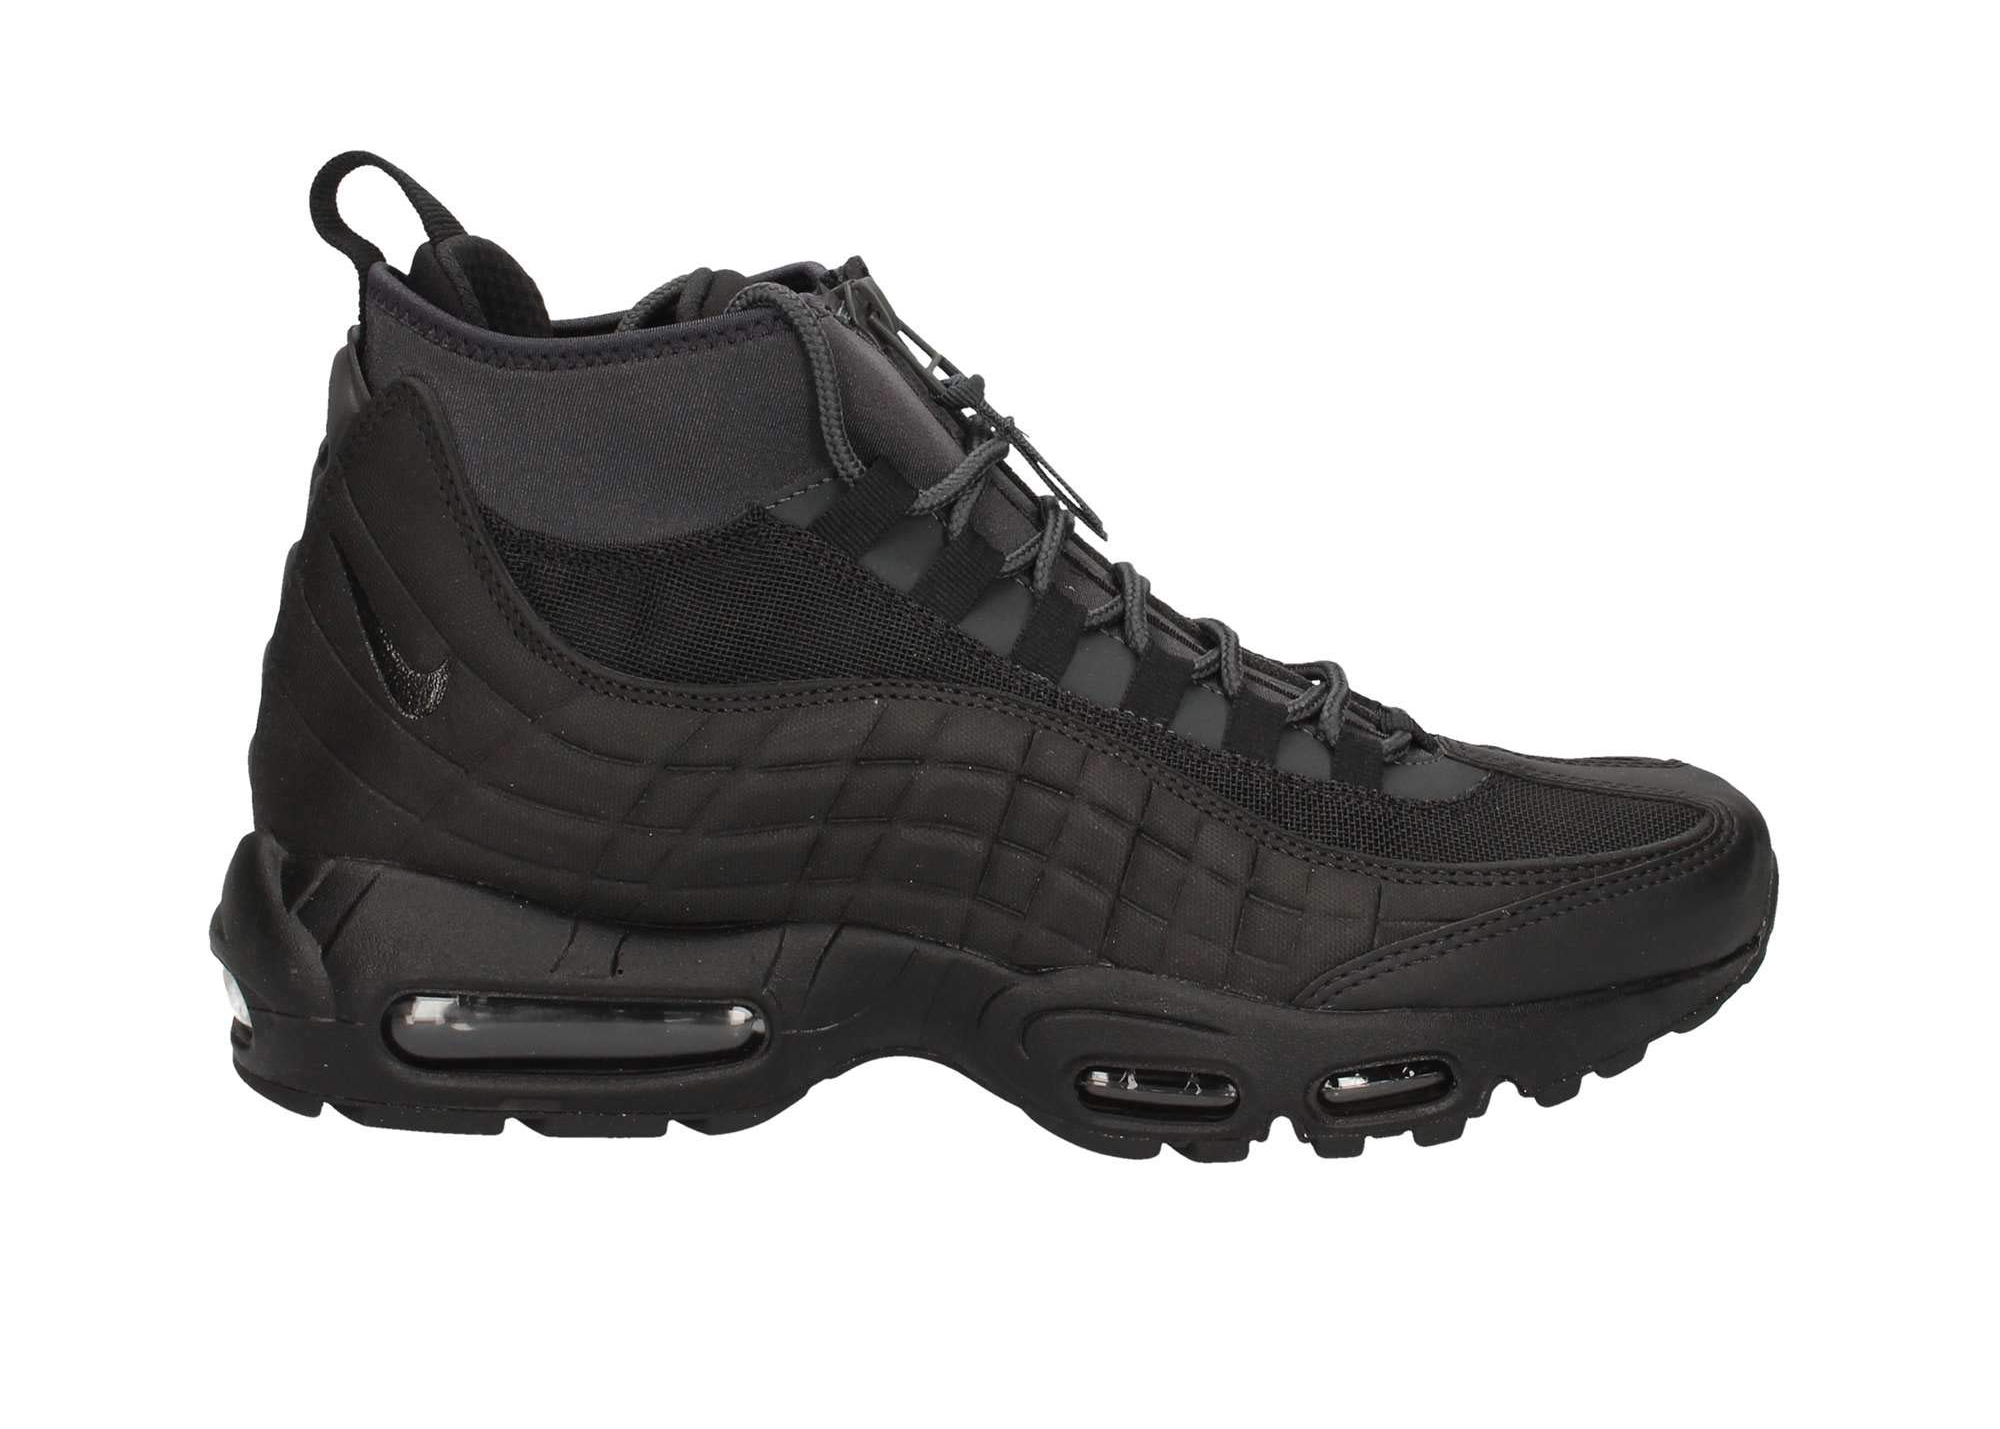 Nike Air Max 95 Sneakerboot Black Anthracite